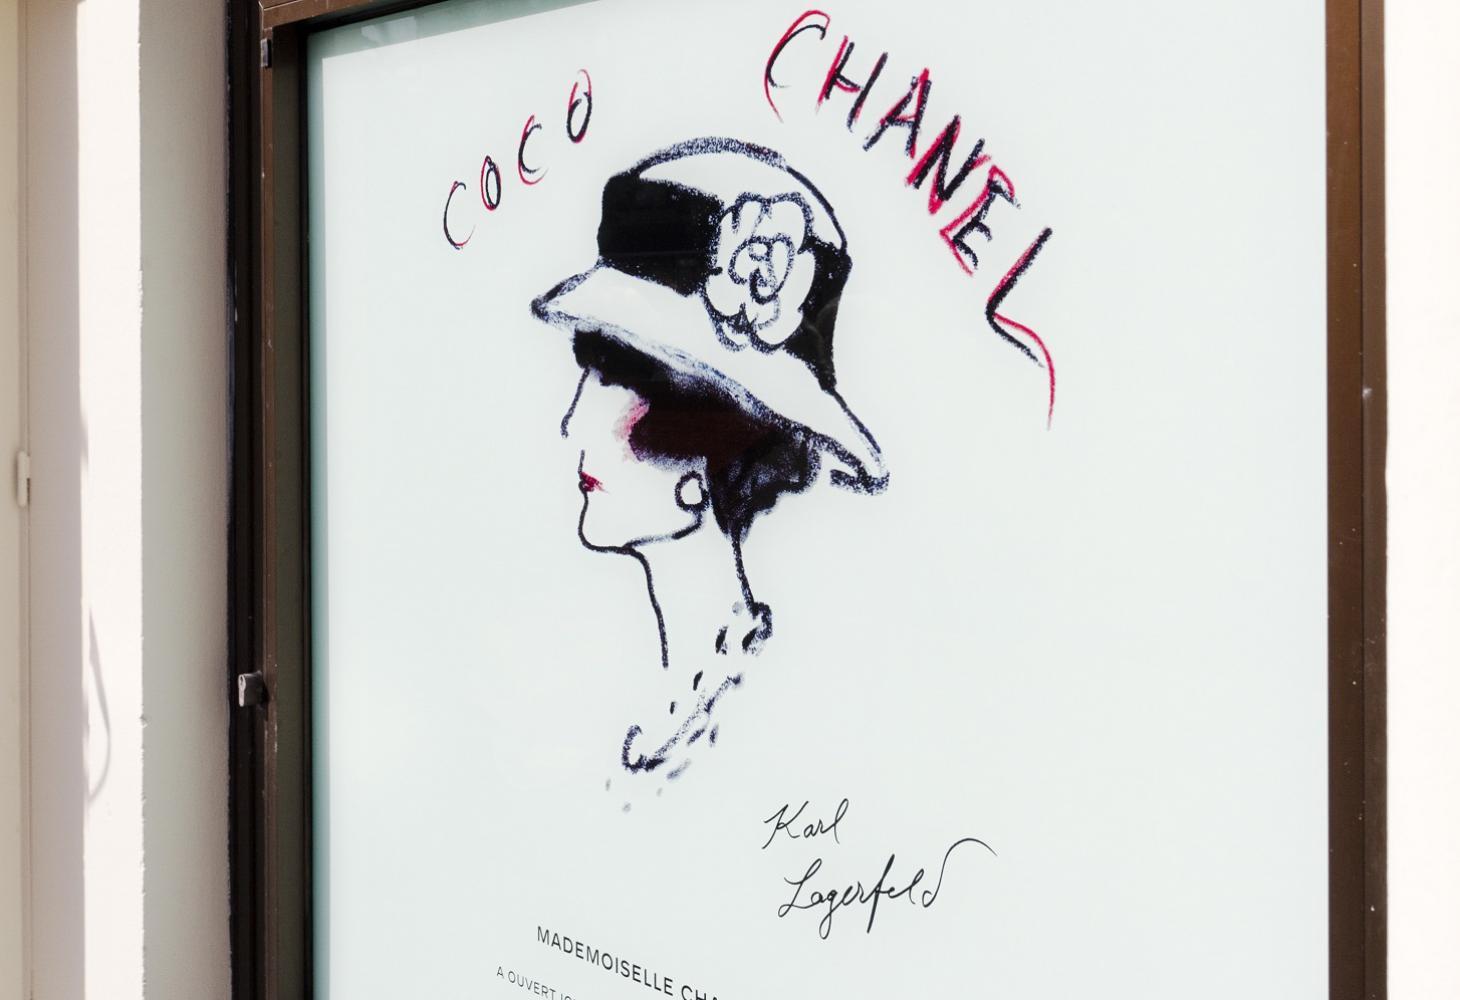 Chanel plaque